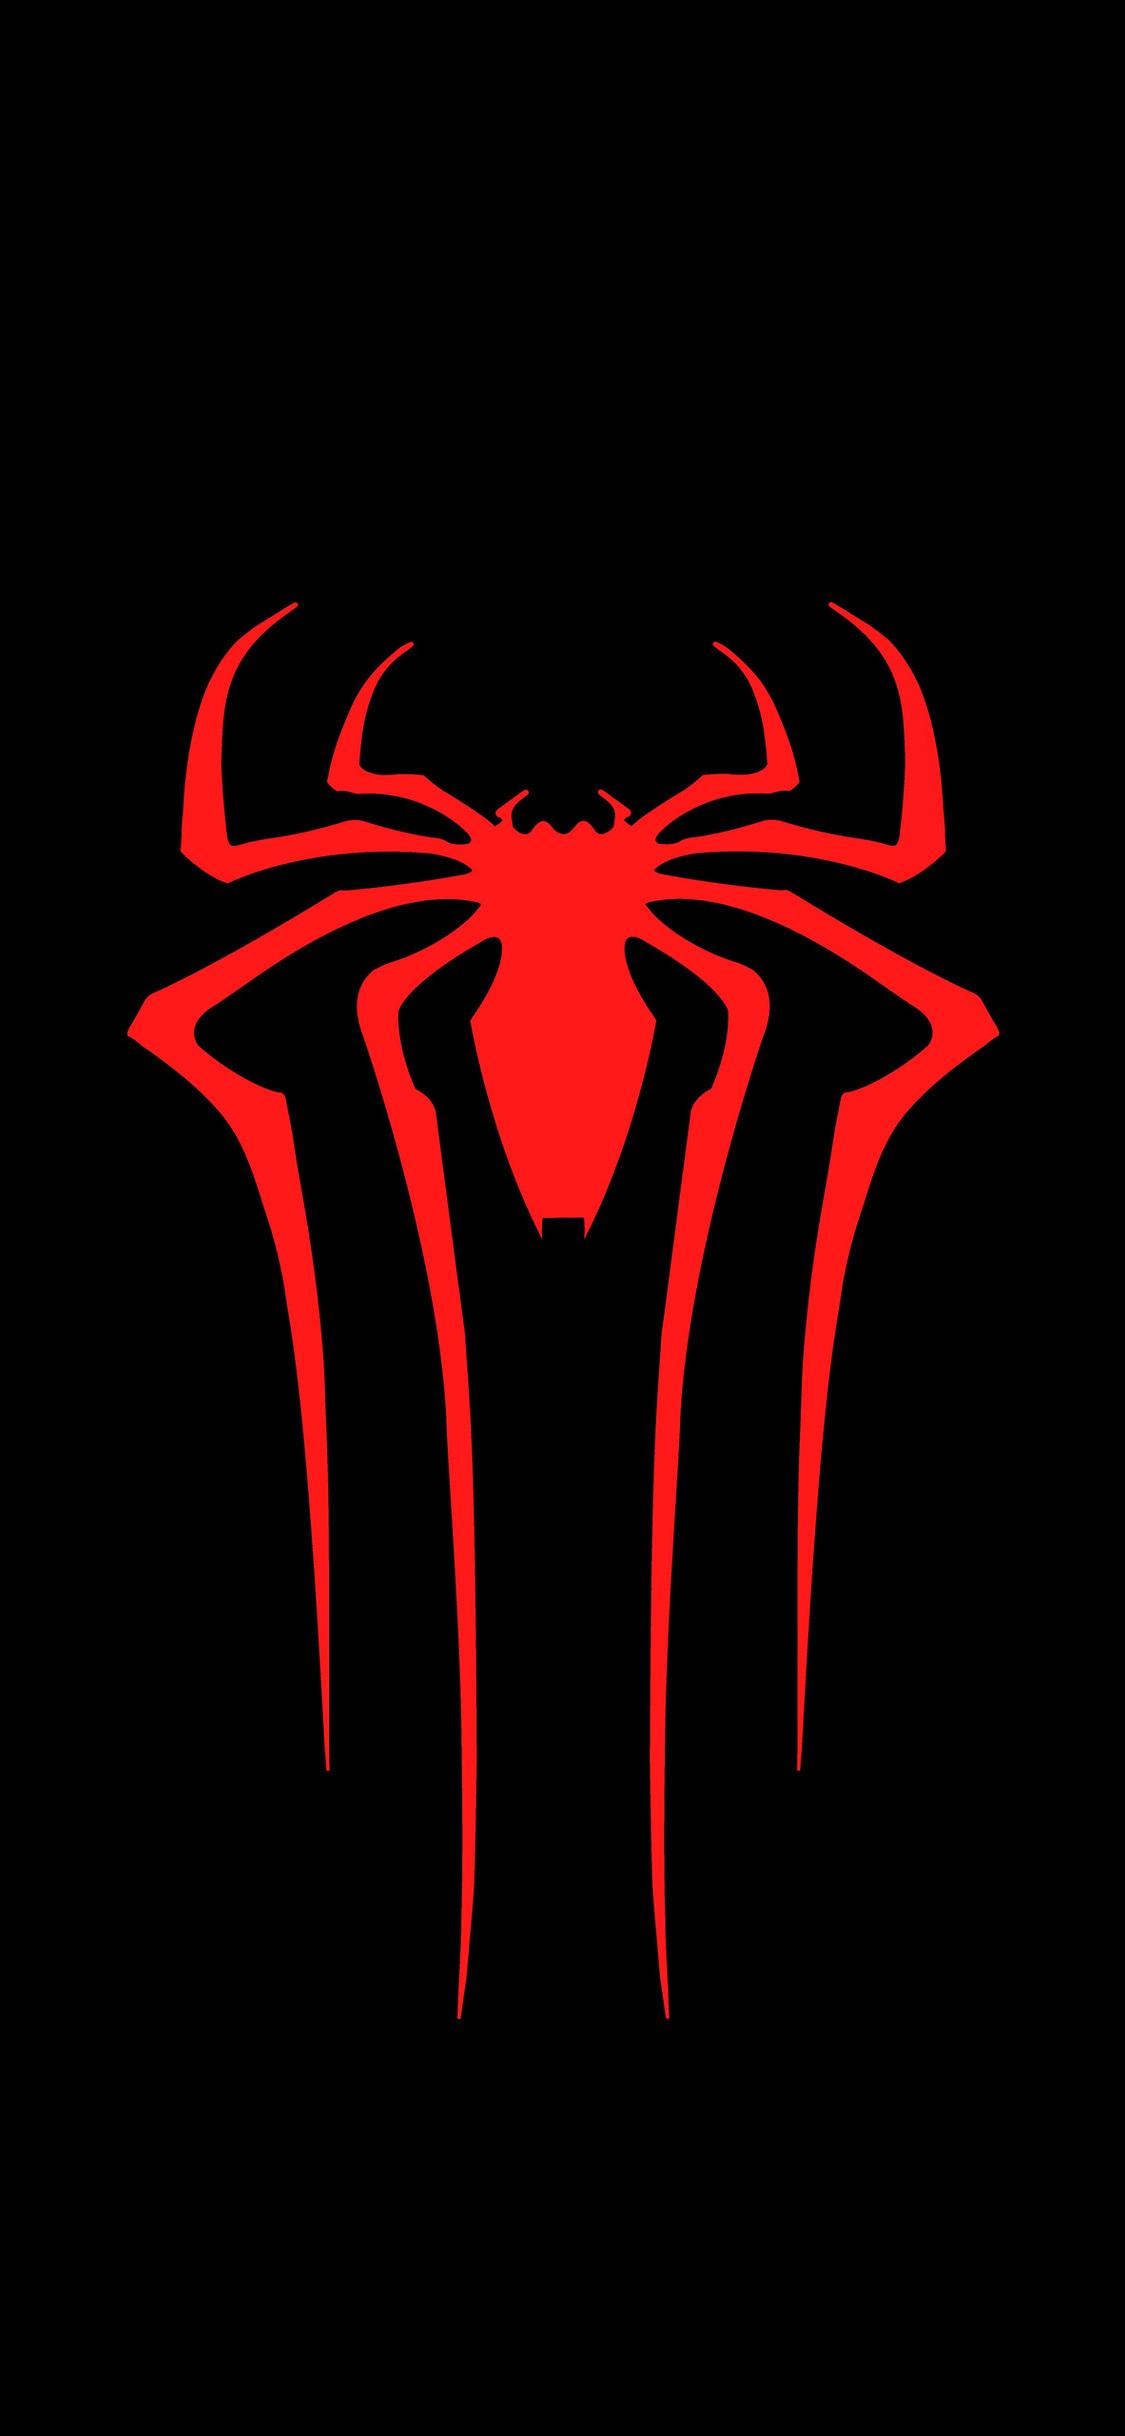 1125x2436 Spiderman Logo 8k Iphone Xs Iphone 10 Iphone X Hd